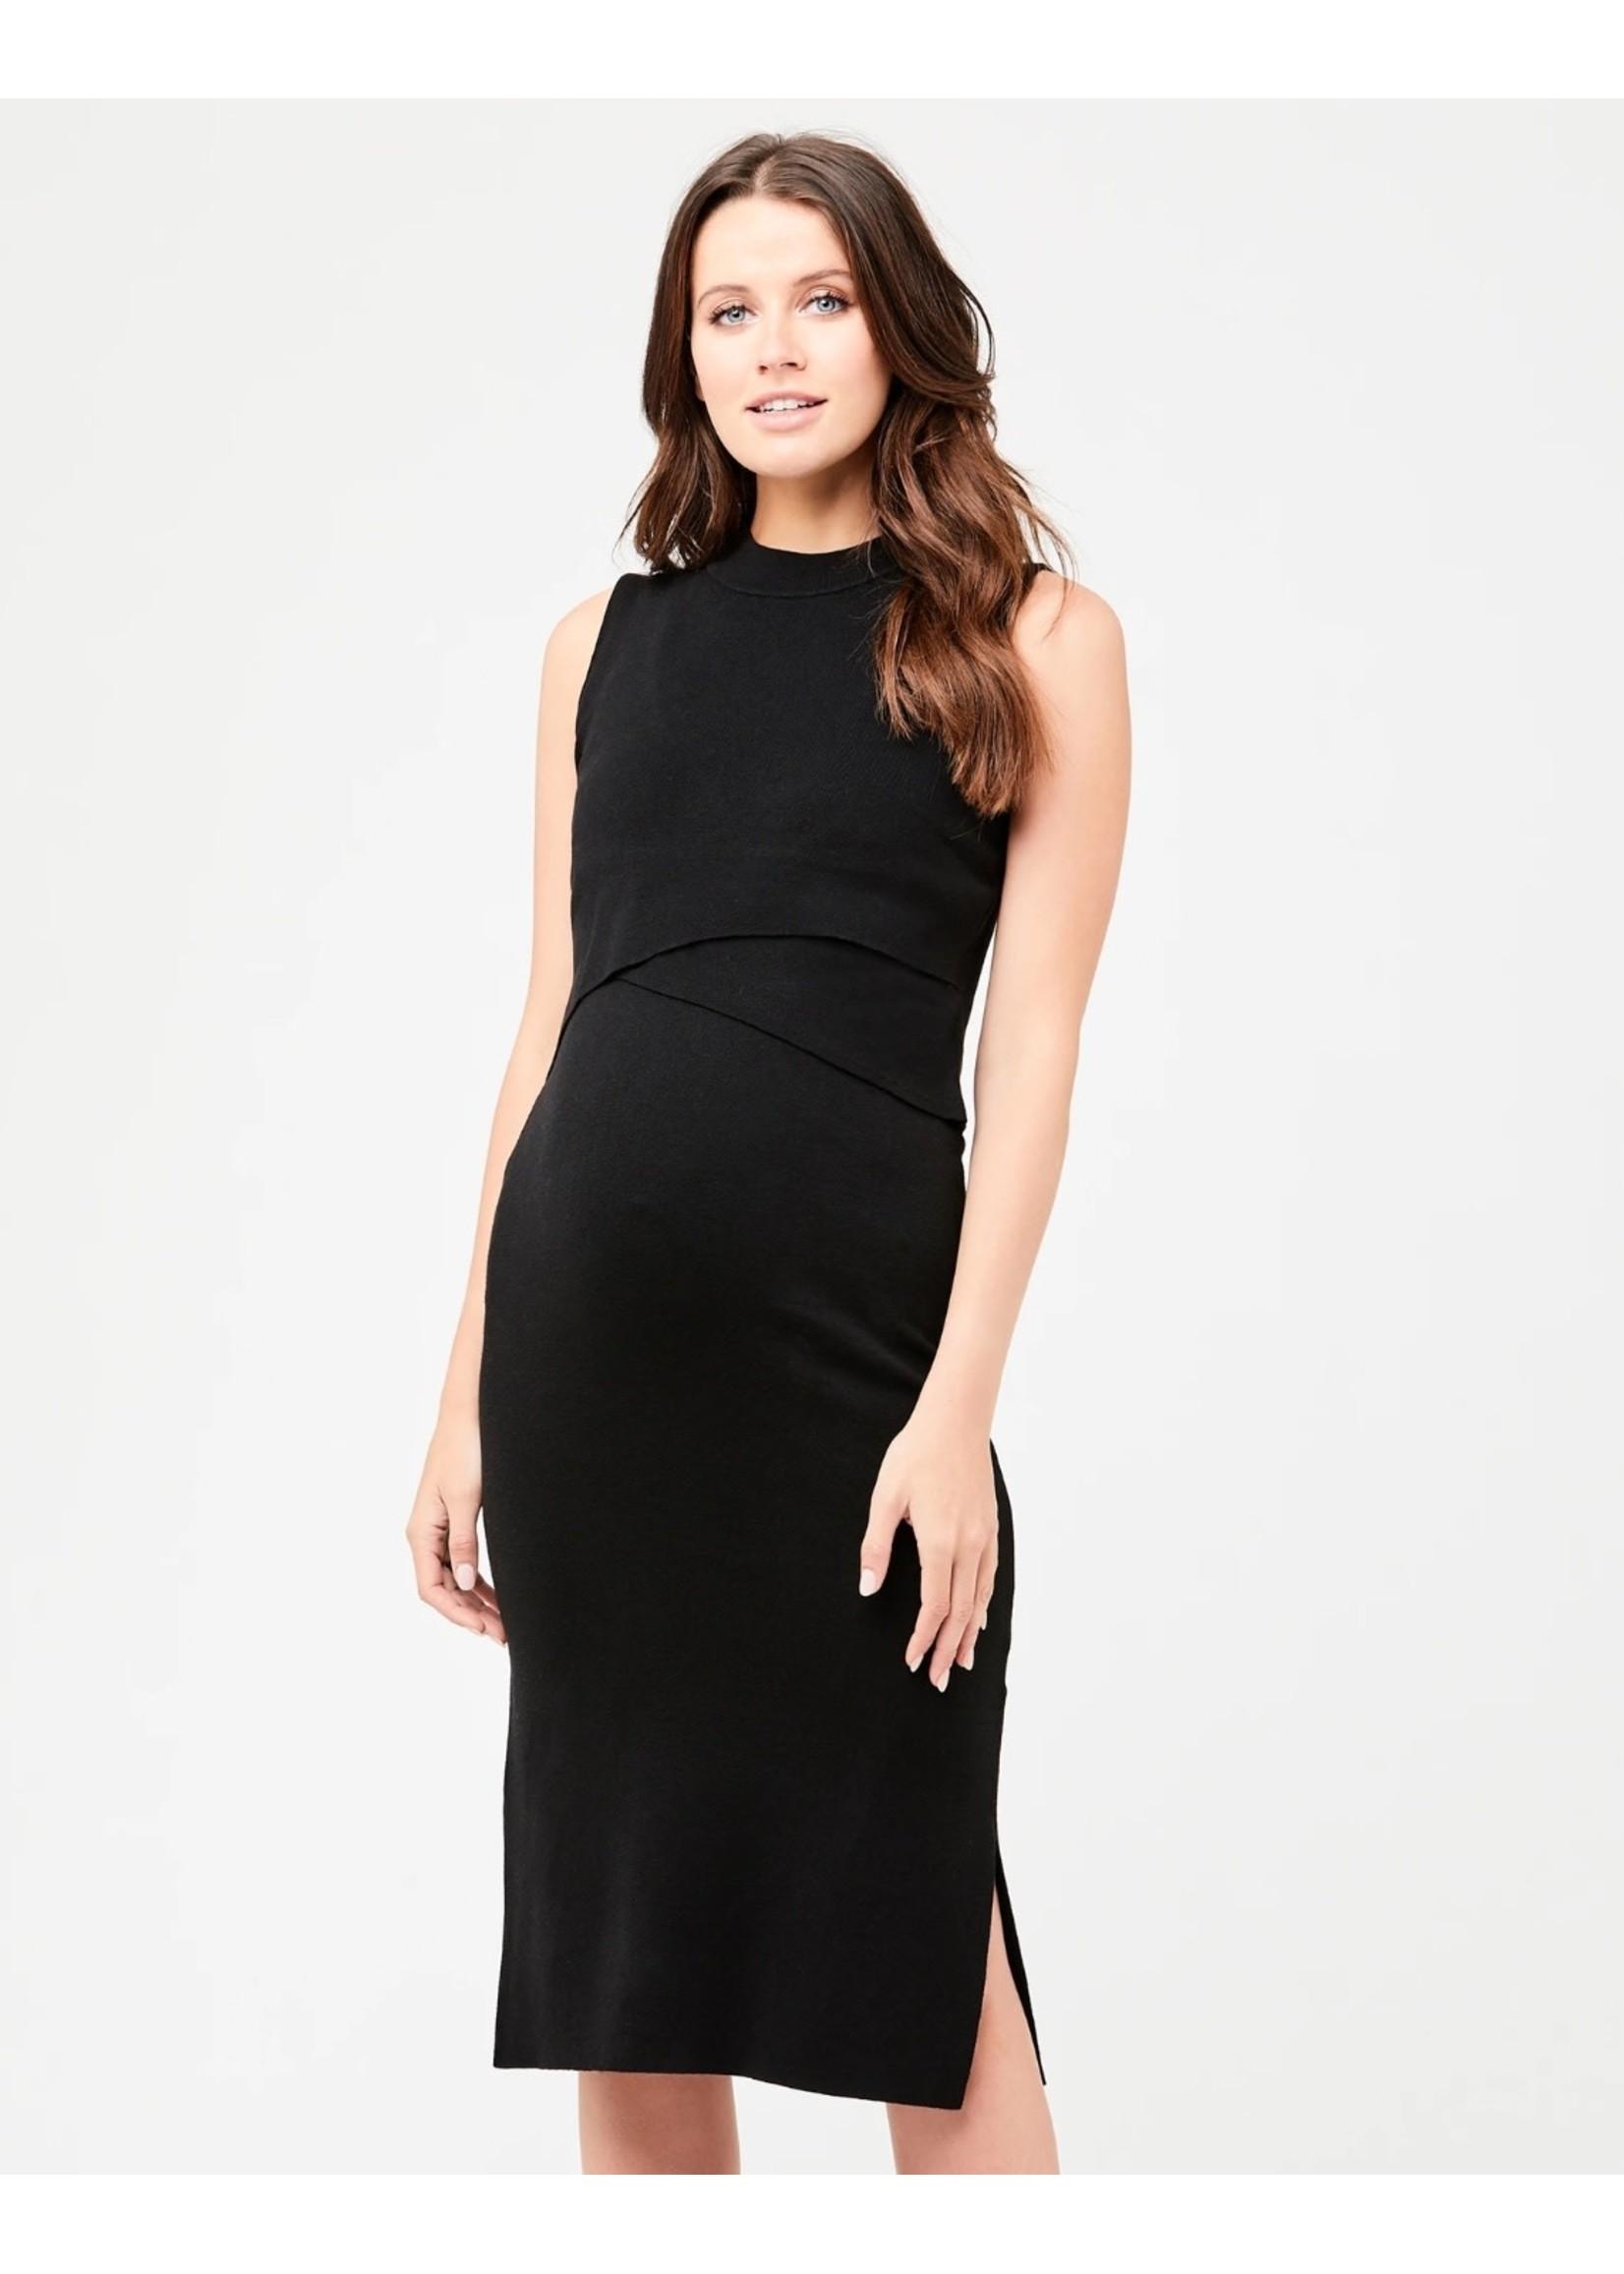 Ripe Maternity RIpe Maternity, Layered Knit Nursing Dress in Black